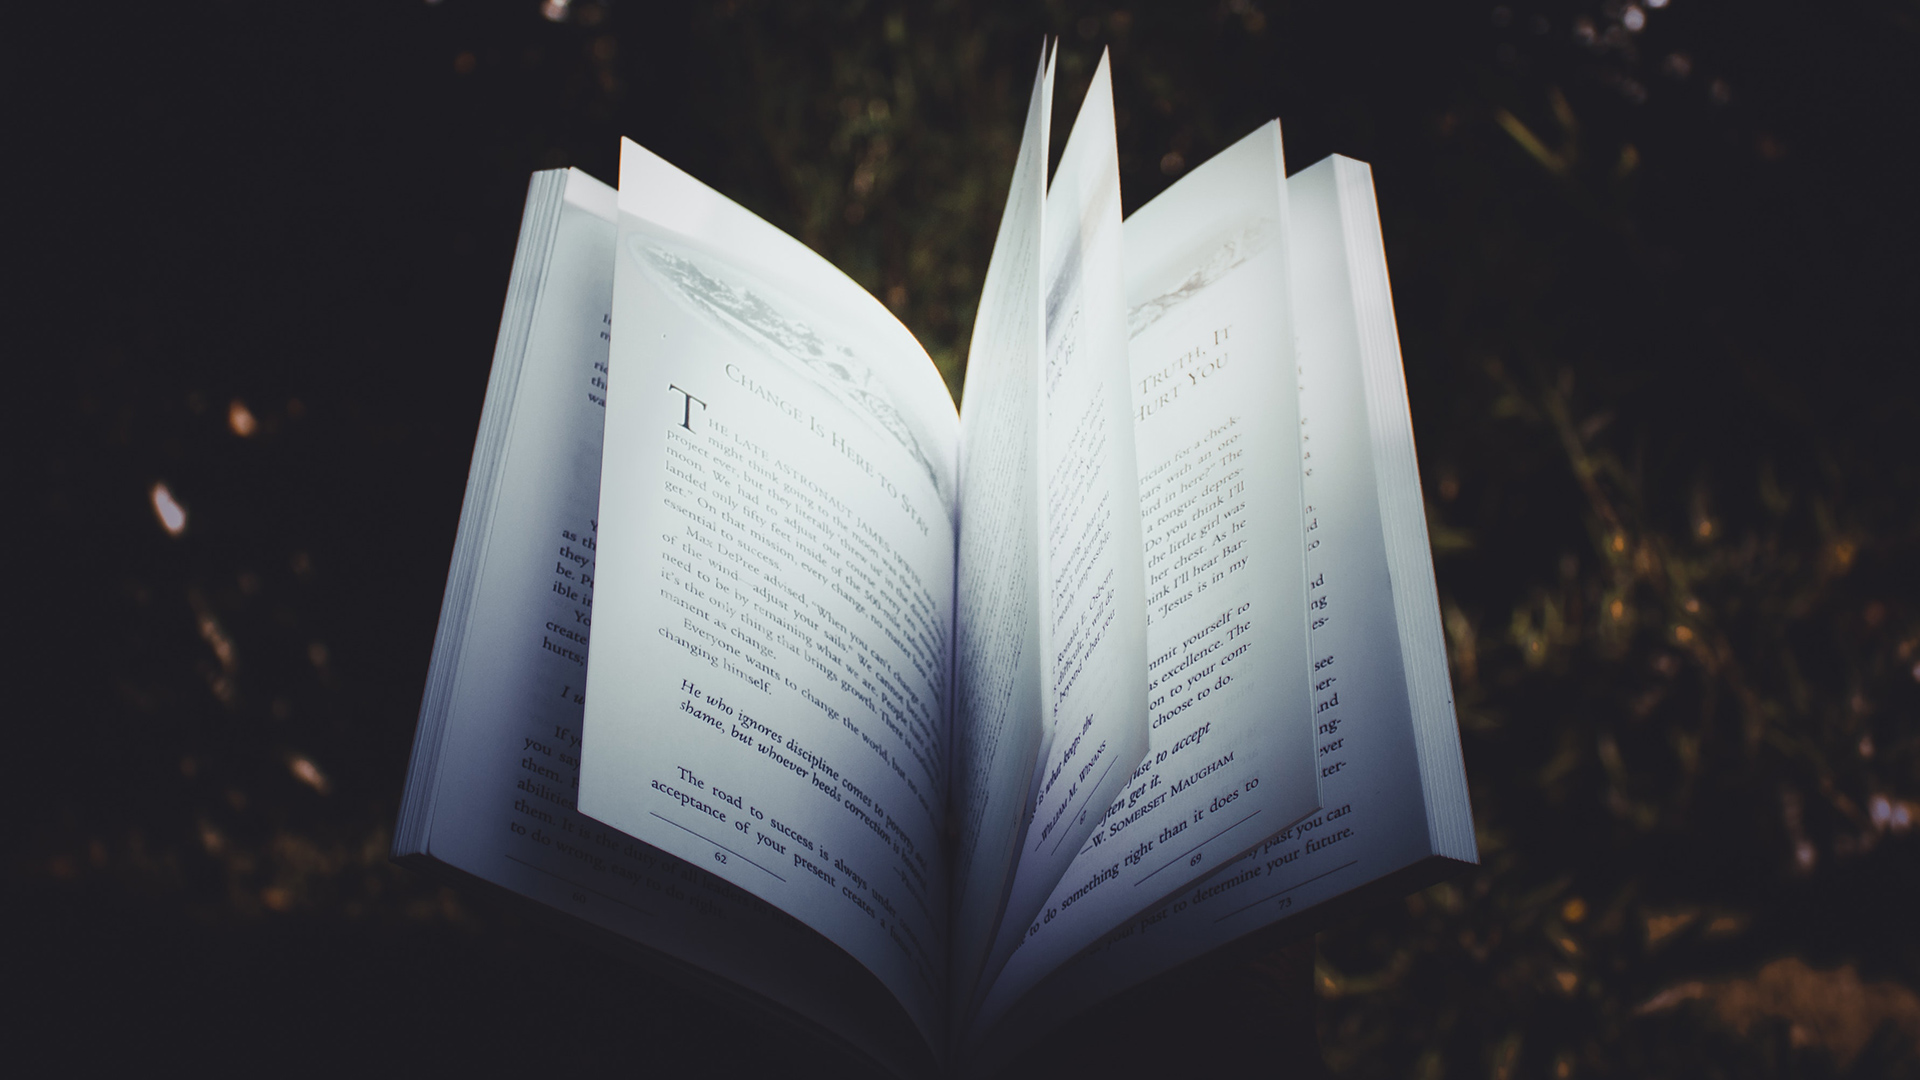 Bina-Qurani-Pengertian-Teks-Eksplanasi